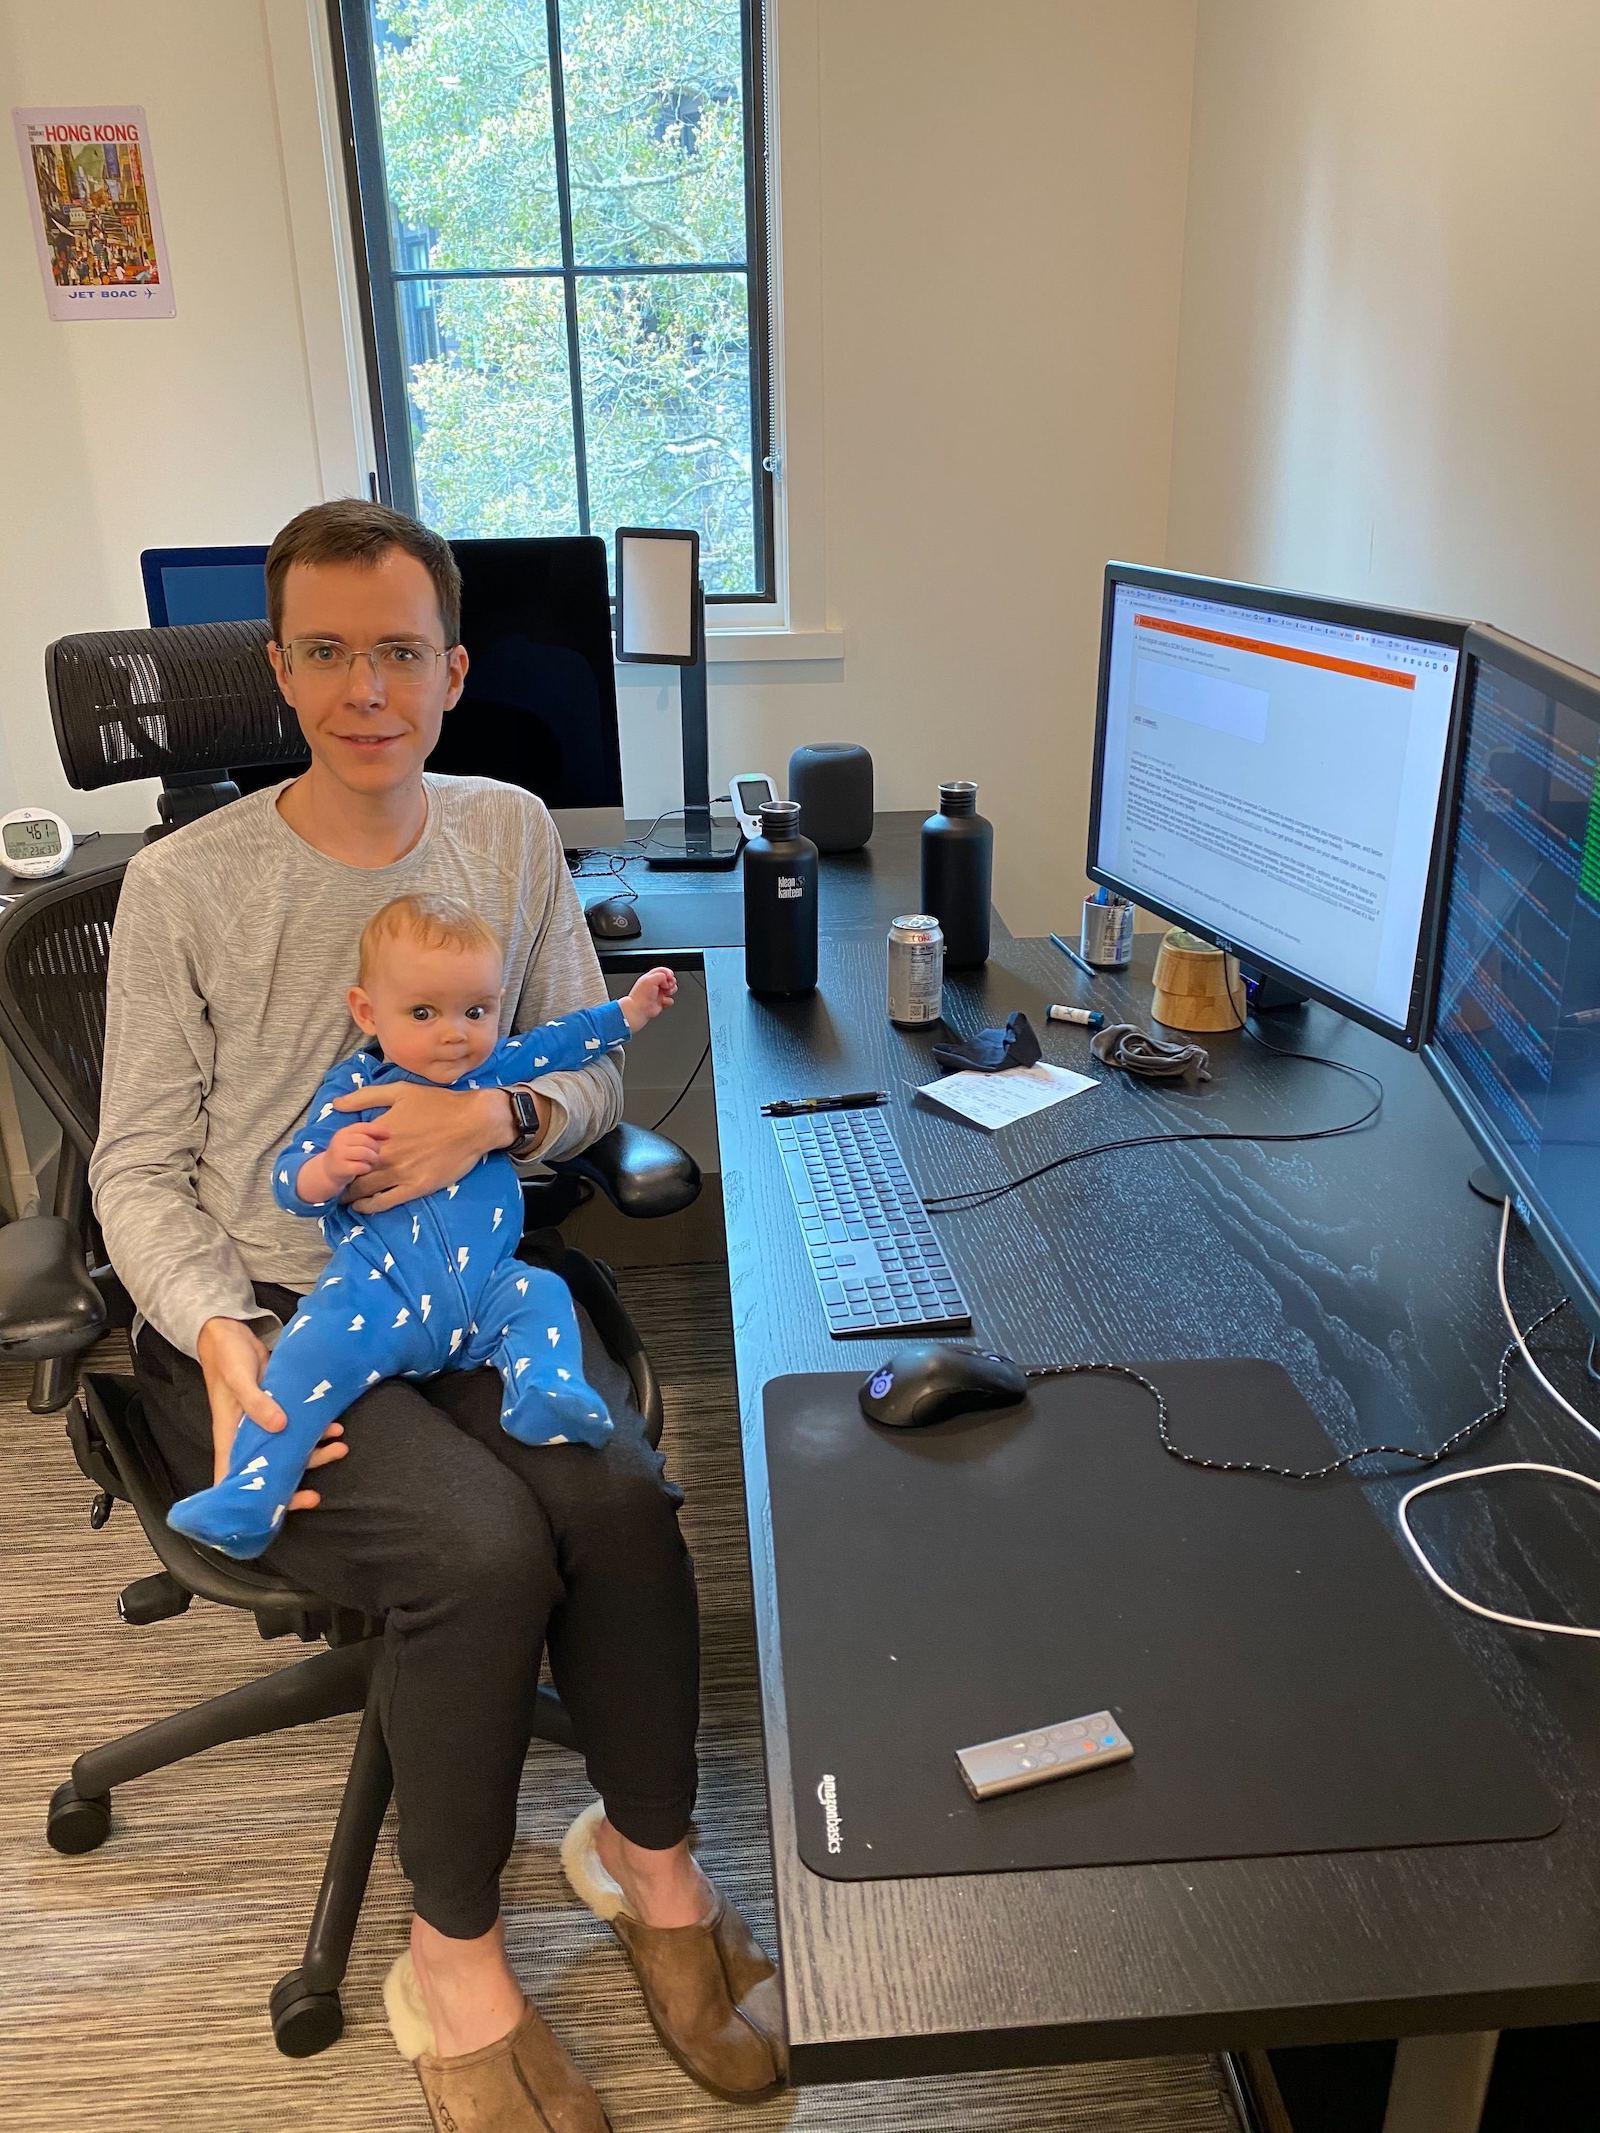 Home office setup of Quinn Slack, CEO